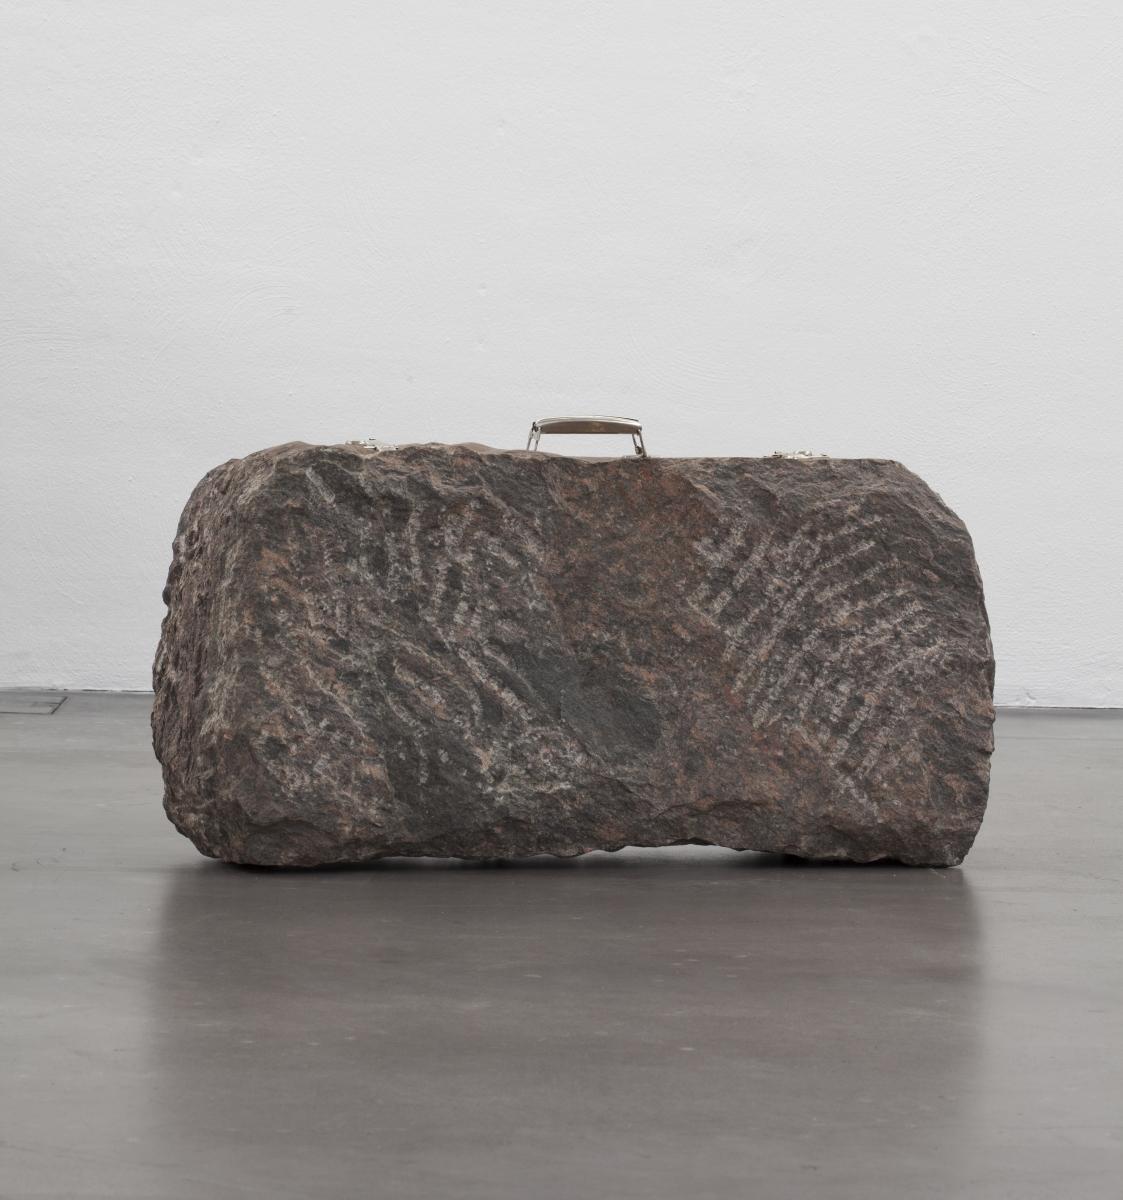 Gediminas Urbonas, Suitcase, 1988, Collections, photo: Finnish National Gallery/Pirje Mykkänen